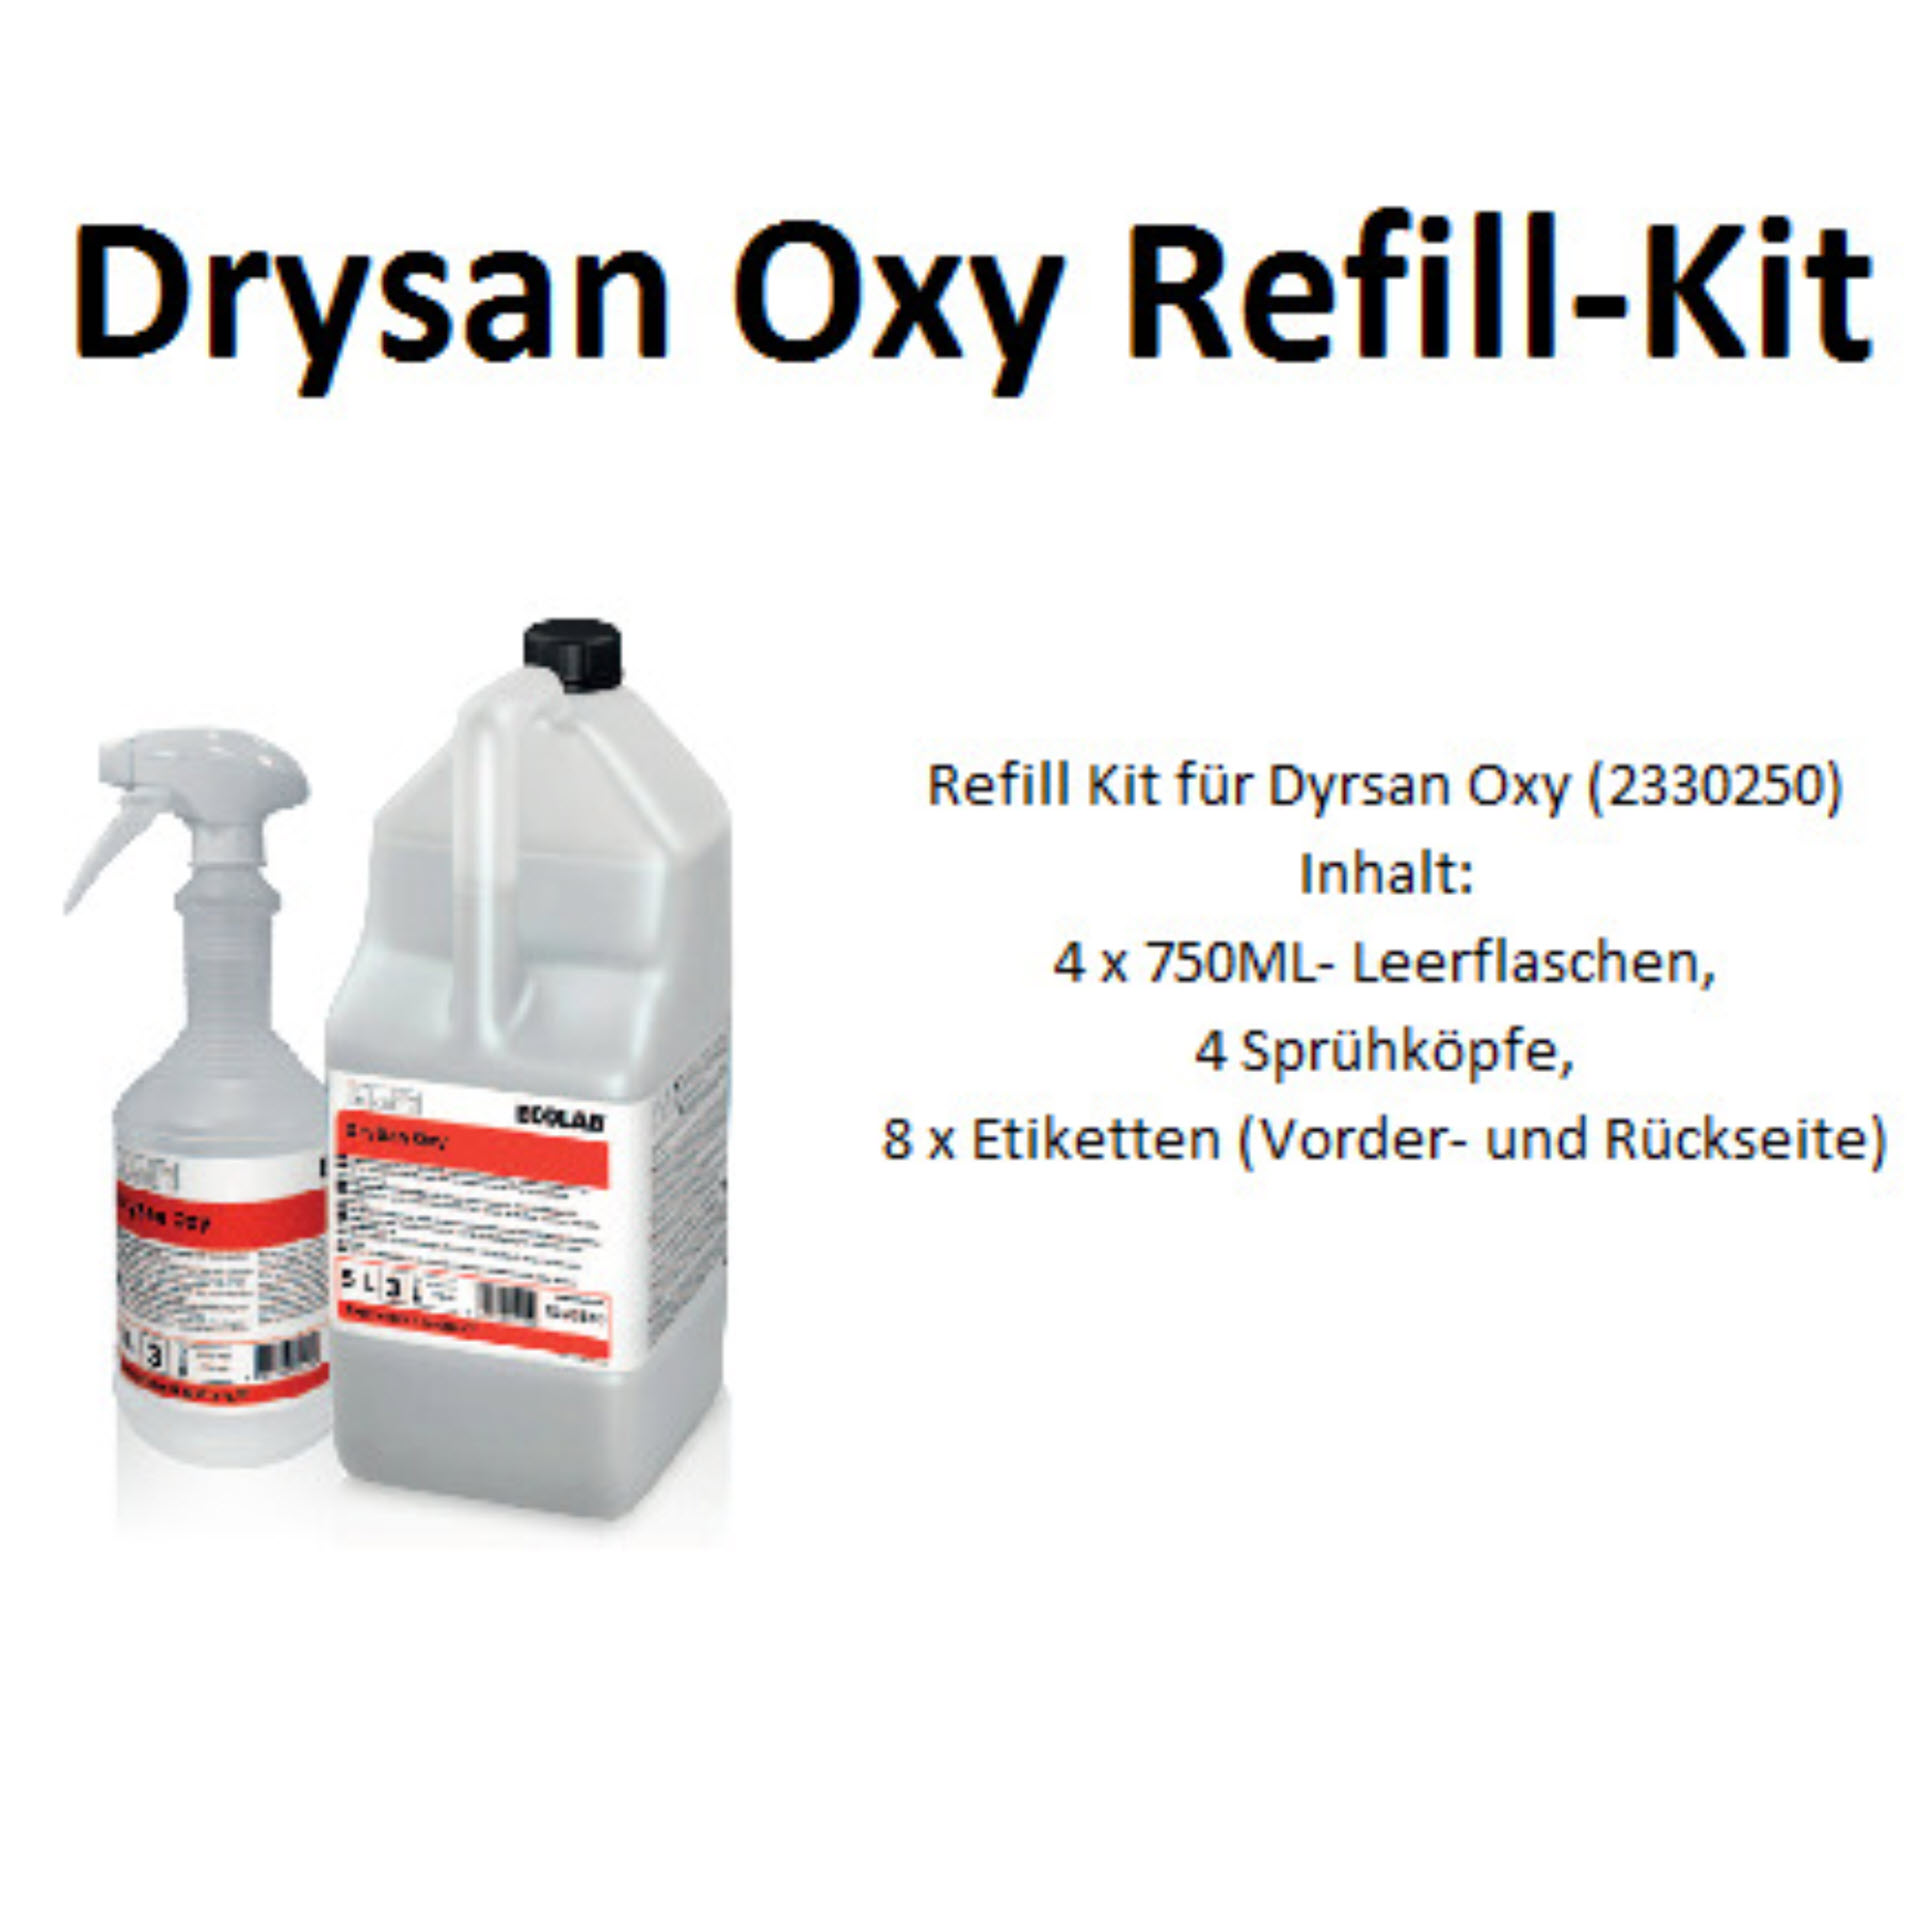 ECOLAB DRYSAN™ OXY Reiniger und Desinfektionsmittel - Refill Kit